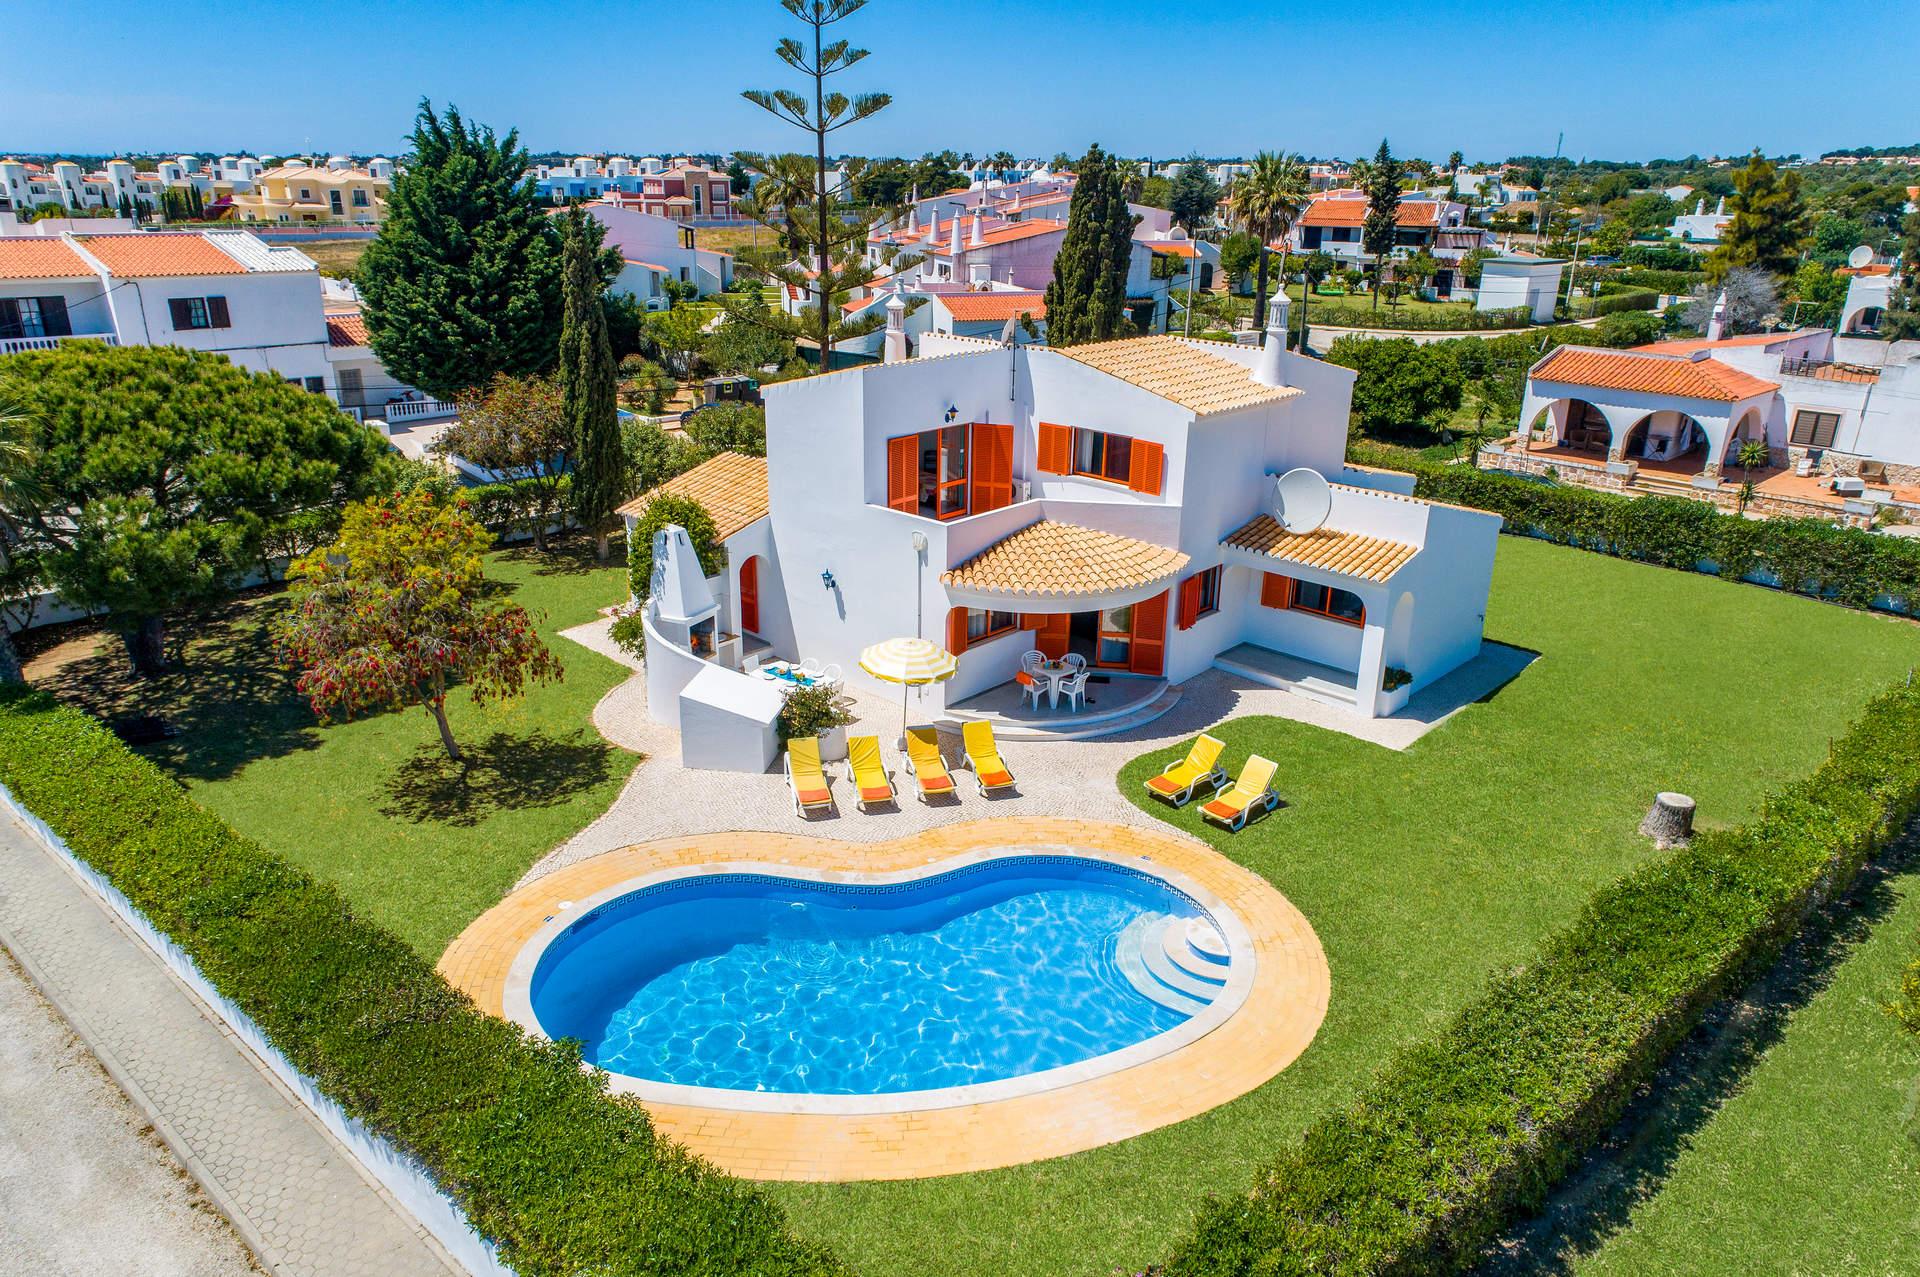 Villa Eduardo, Armacao de Pera, Algarve, Portugal